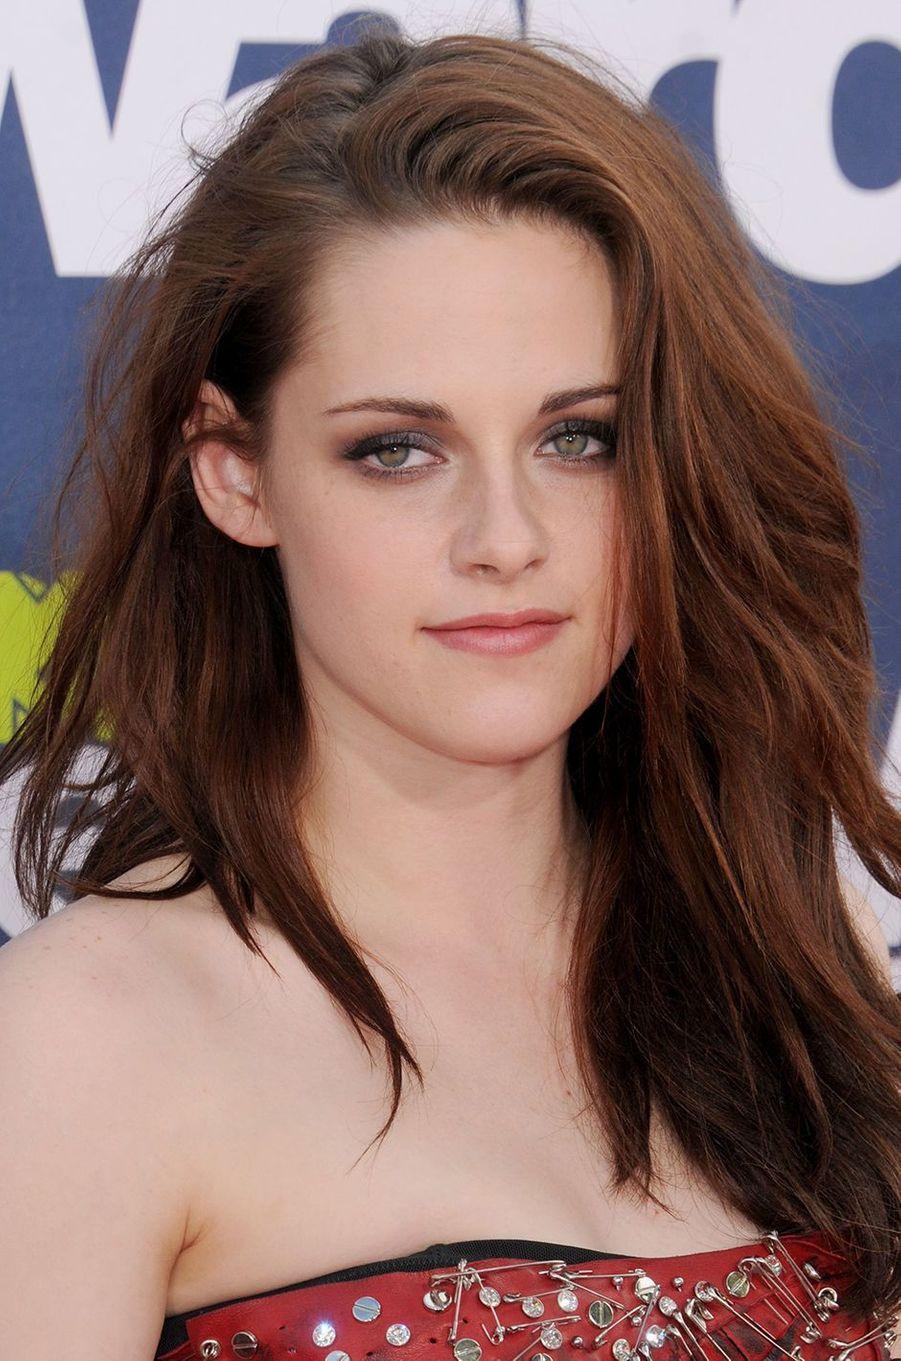 Kristen Stewart aux MTV Movie Awards à Los Angeles en juin 2011